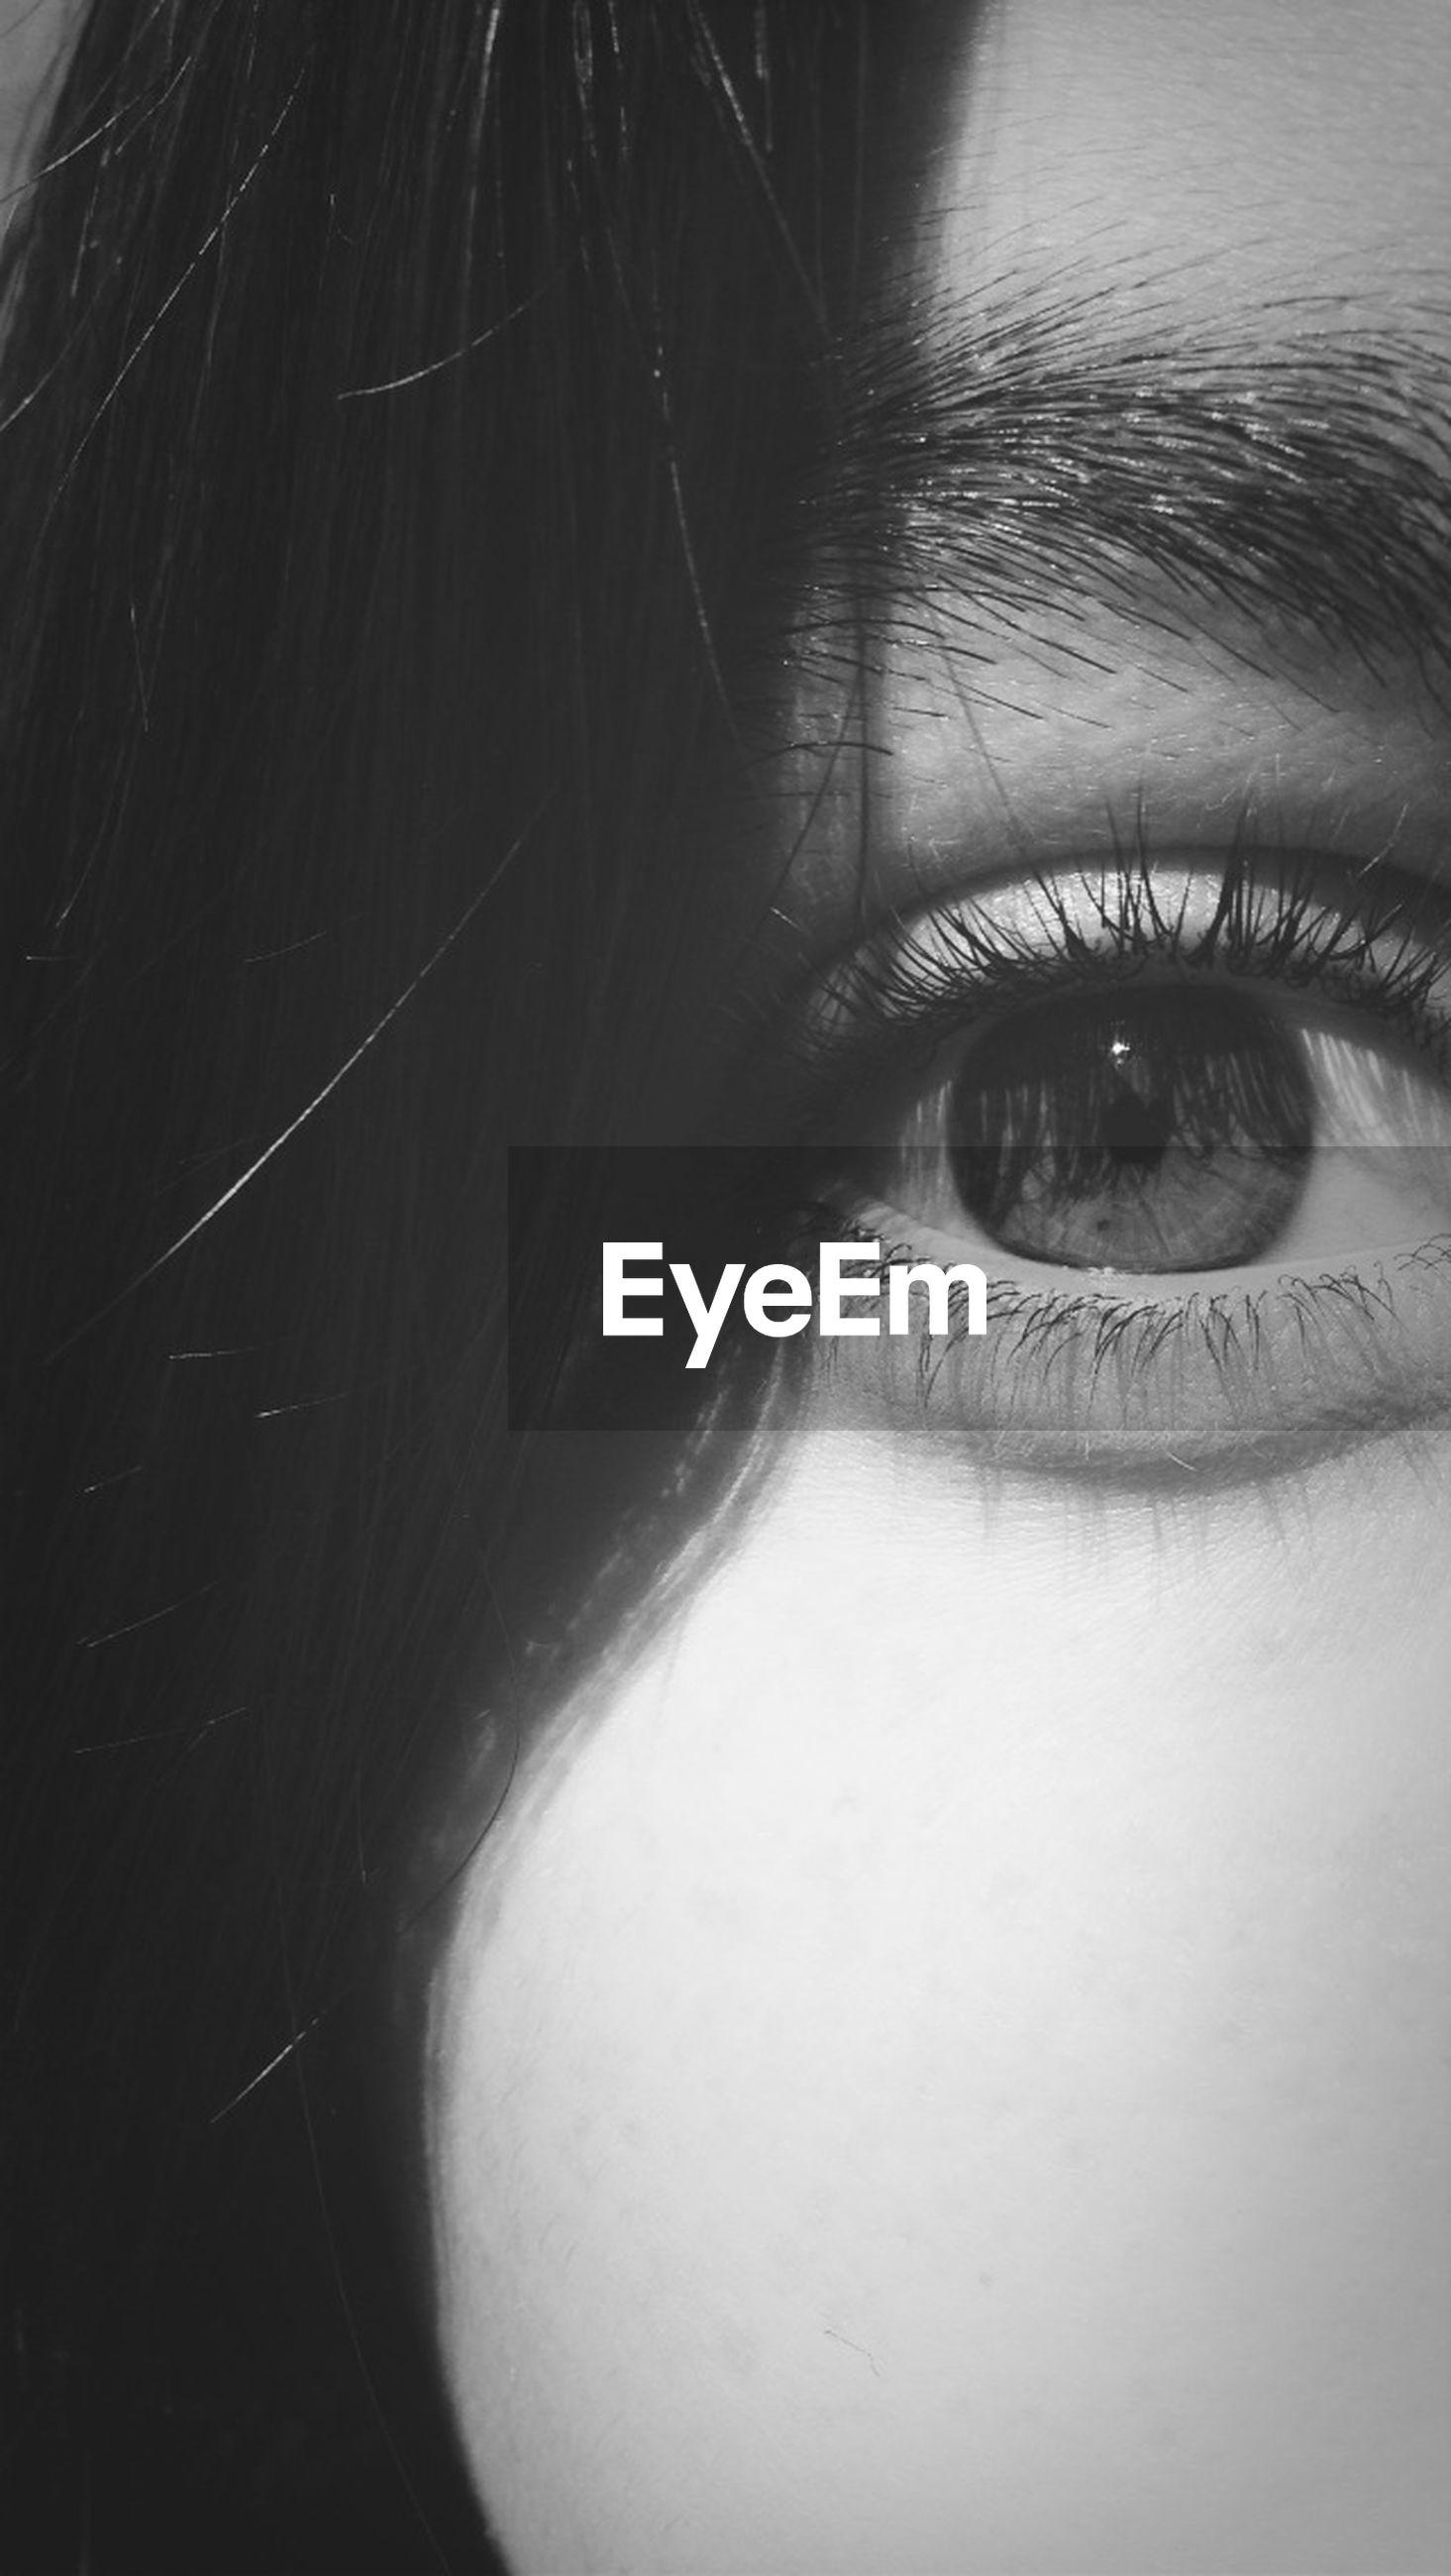 human eye, close-up, human face, headshot, eyelash, eyesight, looking at camera, portrait, lifestyles, part of, human skin, young adult, sensory perception, person, reflection, studio shot, indoors